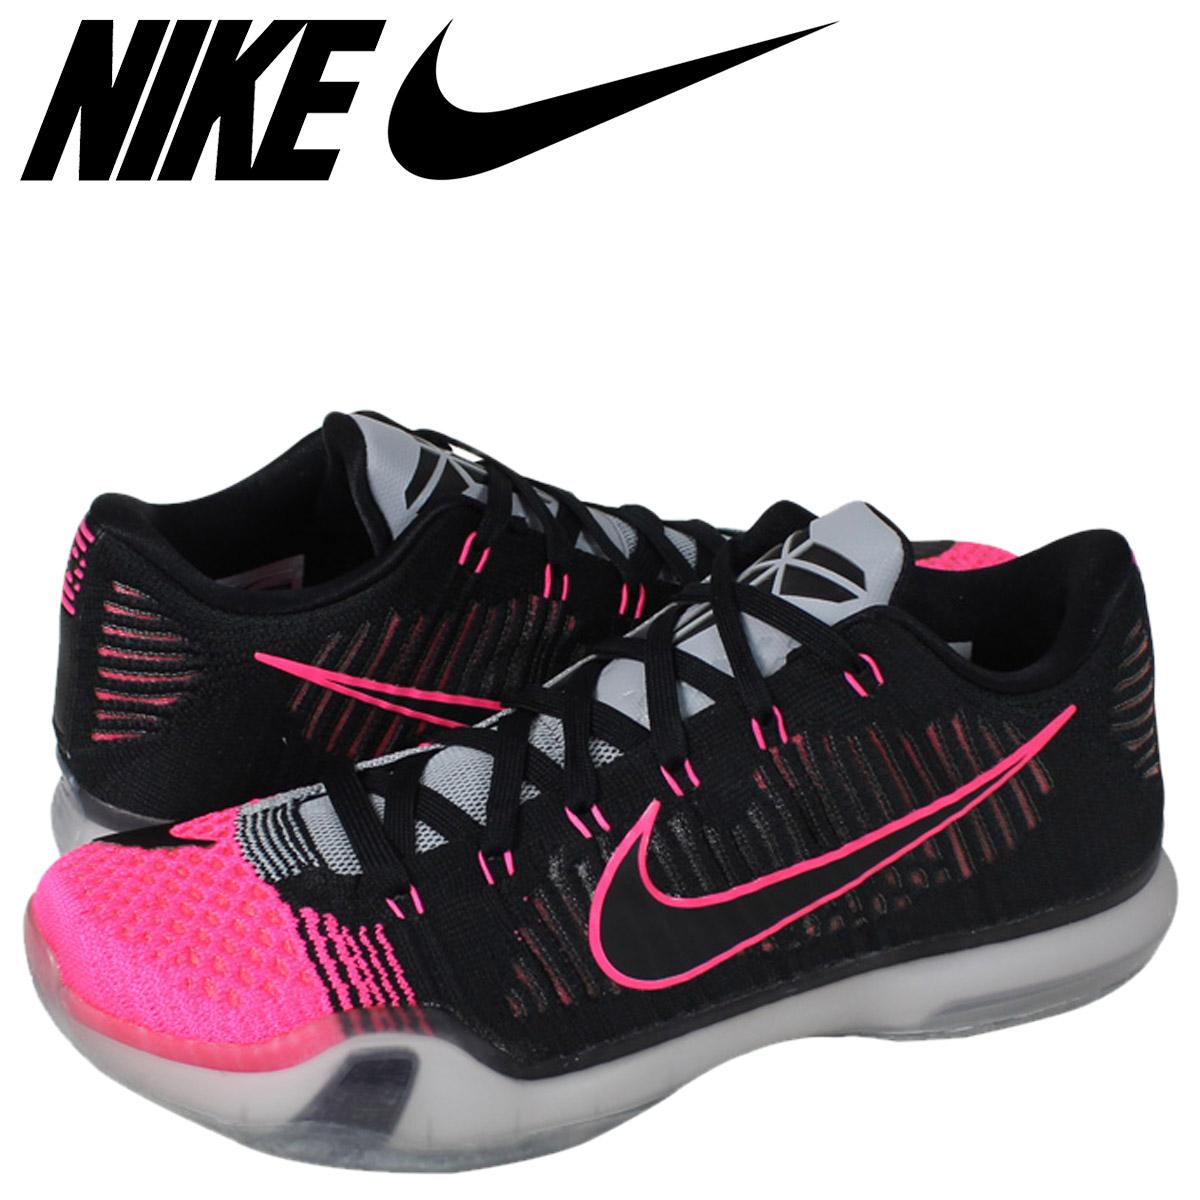 super popular 9b62f dad2c Nike NIKE Corby sneakers KOBE 10 ELITE LOW MAMBACURIAL Corby 10 elite low  747,212-010 black men